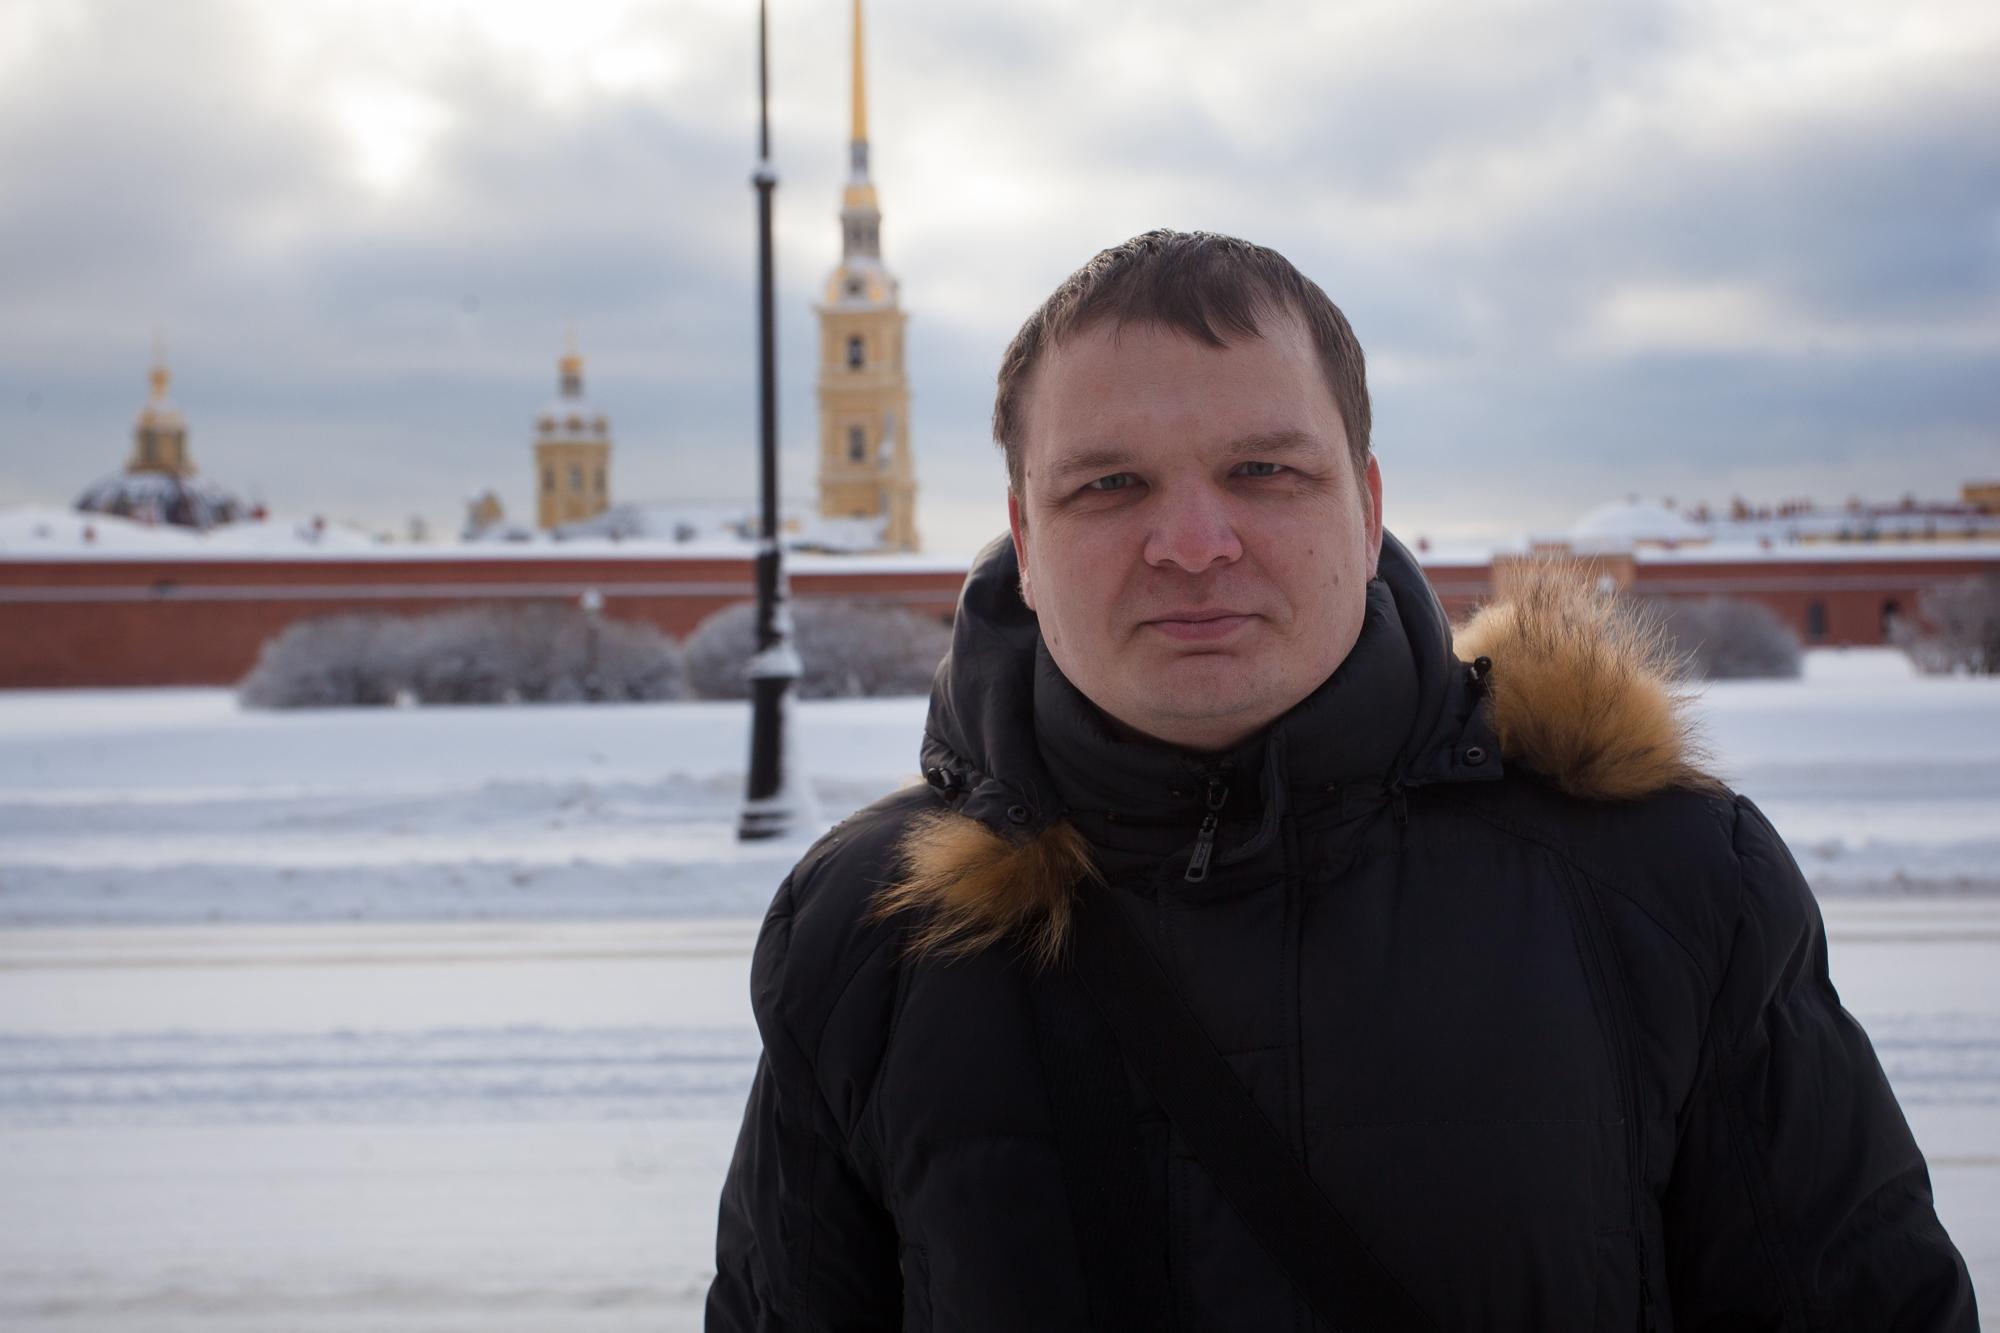 Роман Юрьевич Васин, 40 лет, директор IT-компании